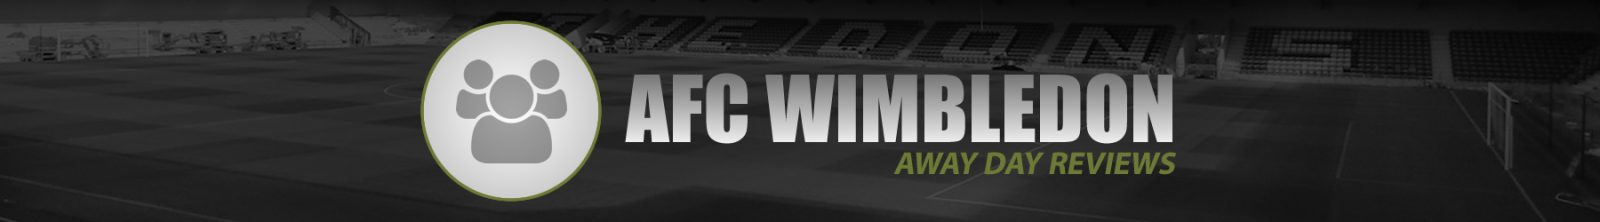 Review AFC Wimbledon